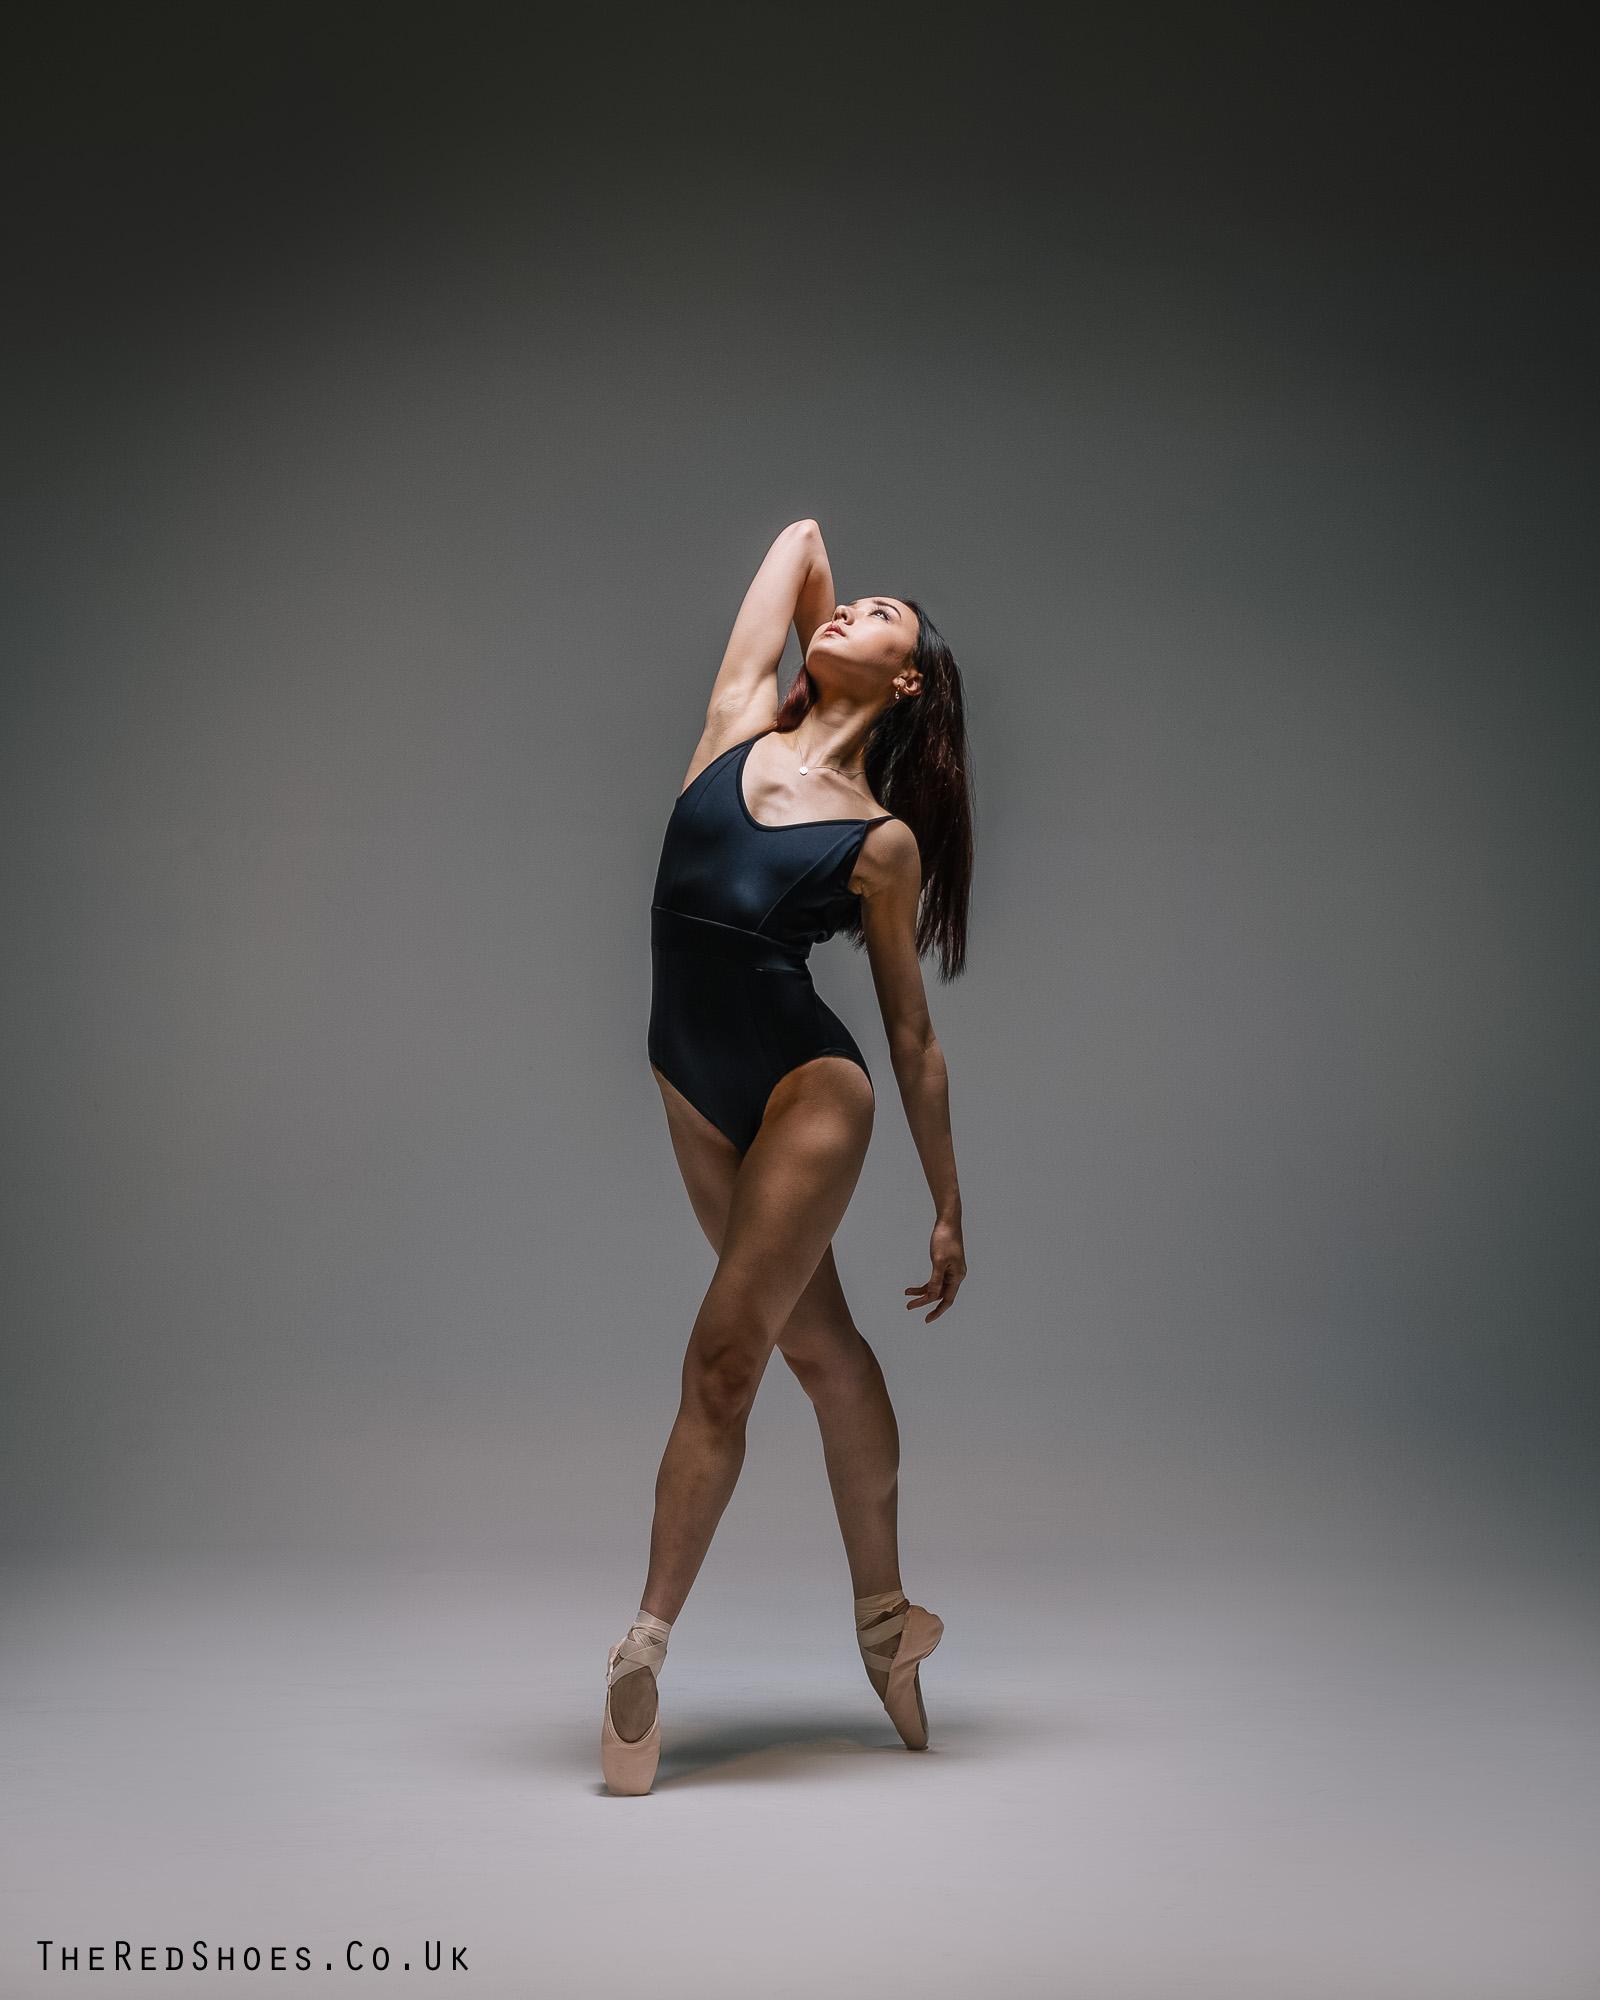 dance-photography-13.jpg